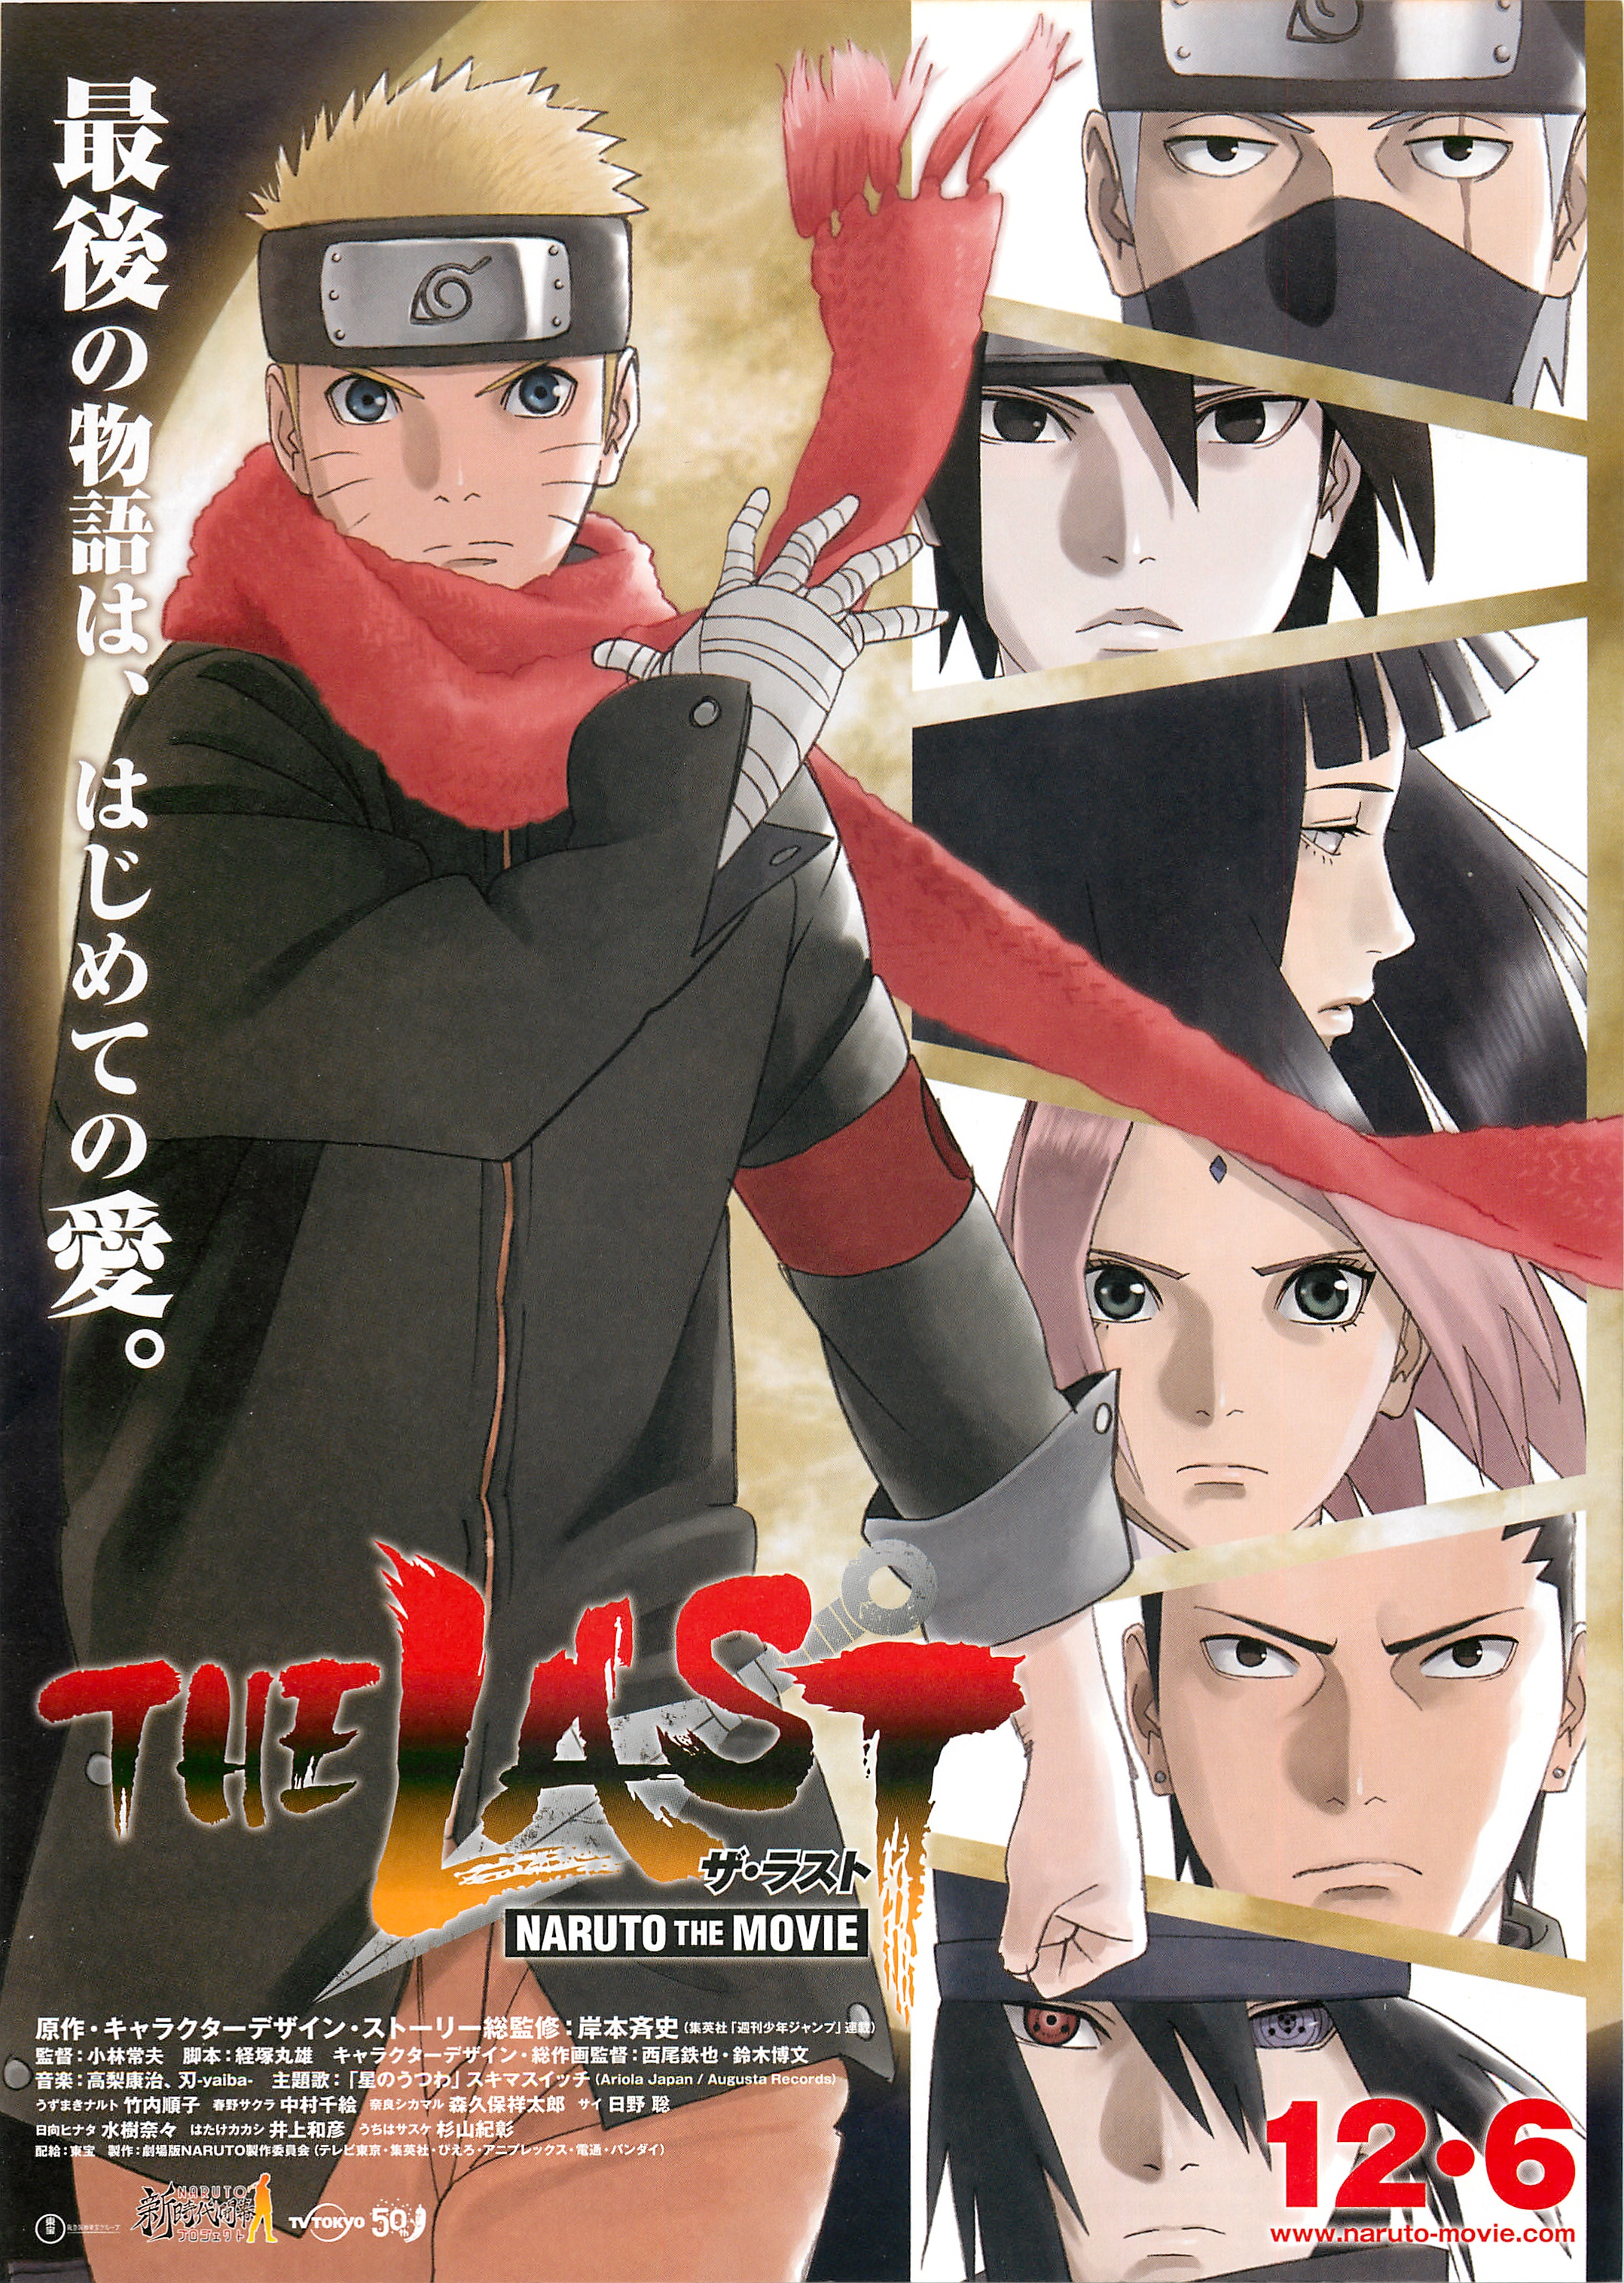 Naruto the Movie The Last visual haruhichan.com Naruto Shippuuden Movie 7 - The Last